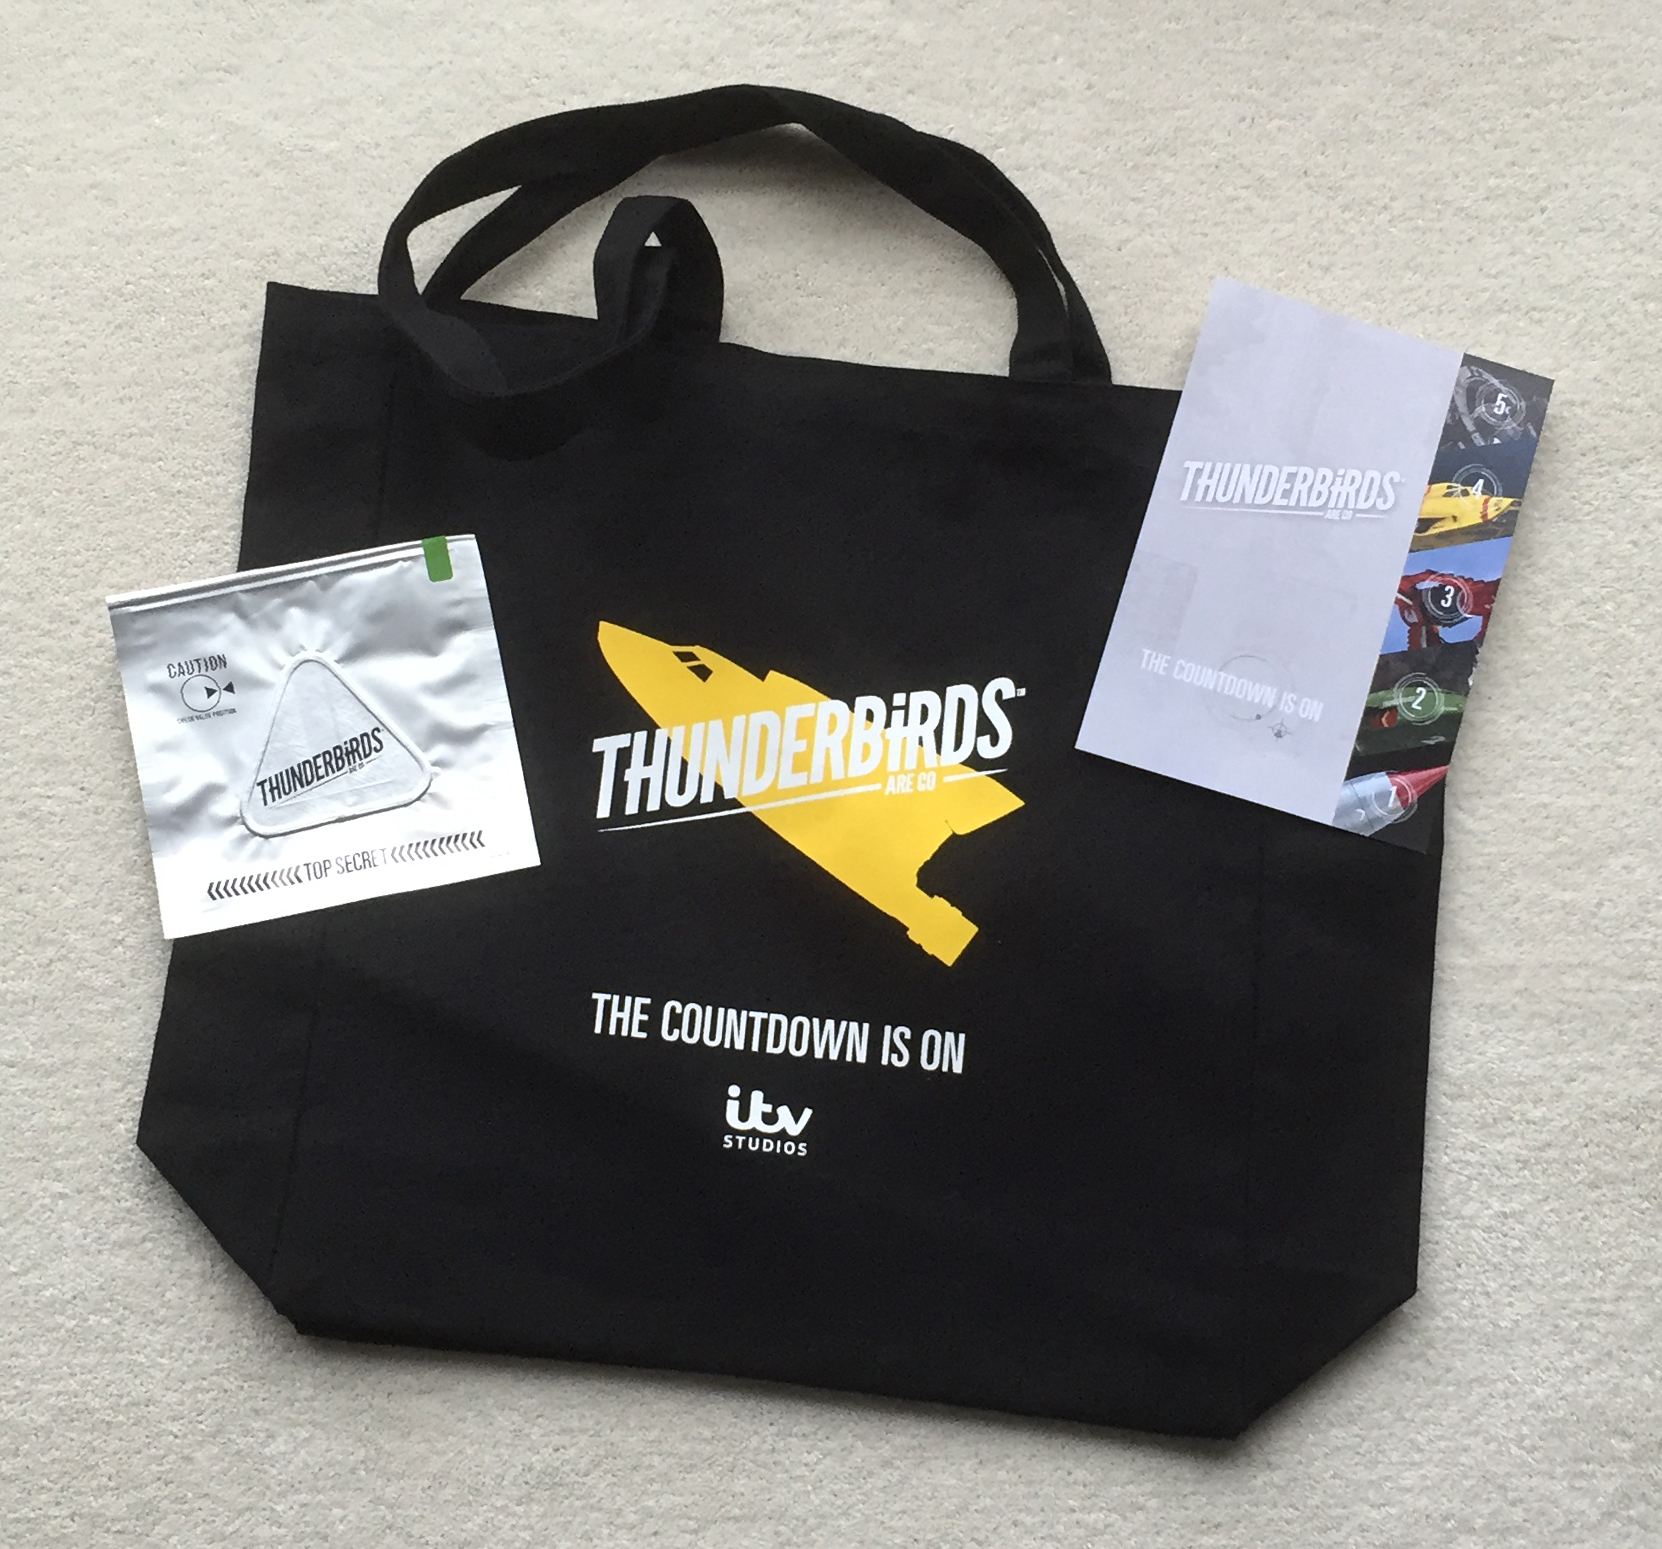 Thunderbird 4 bag